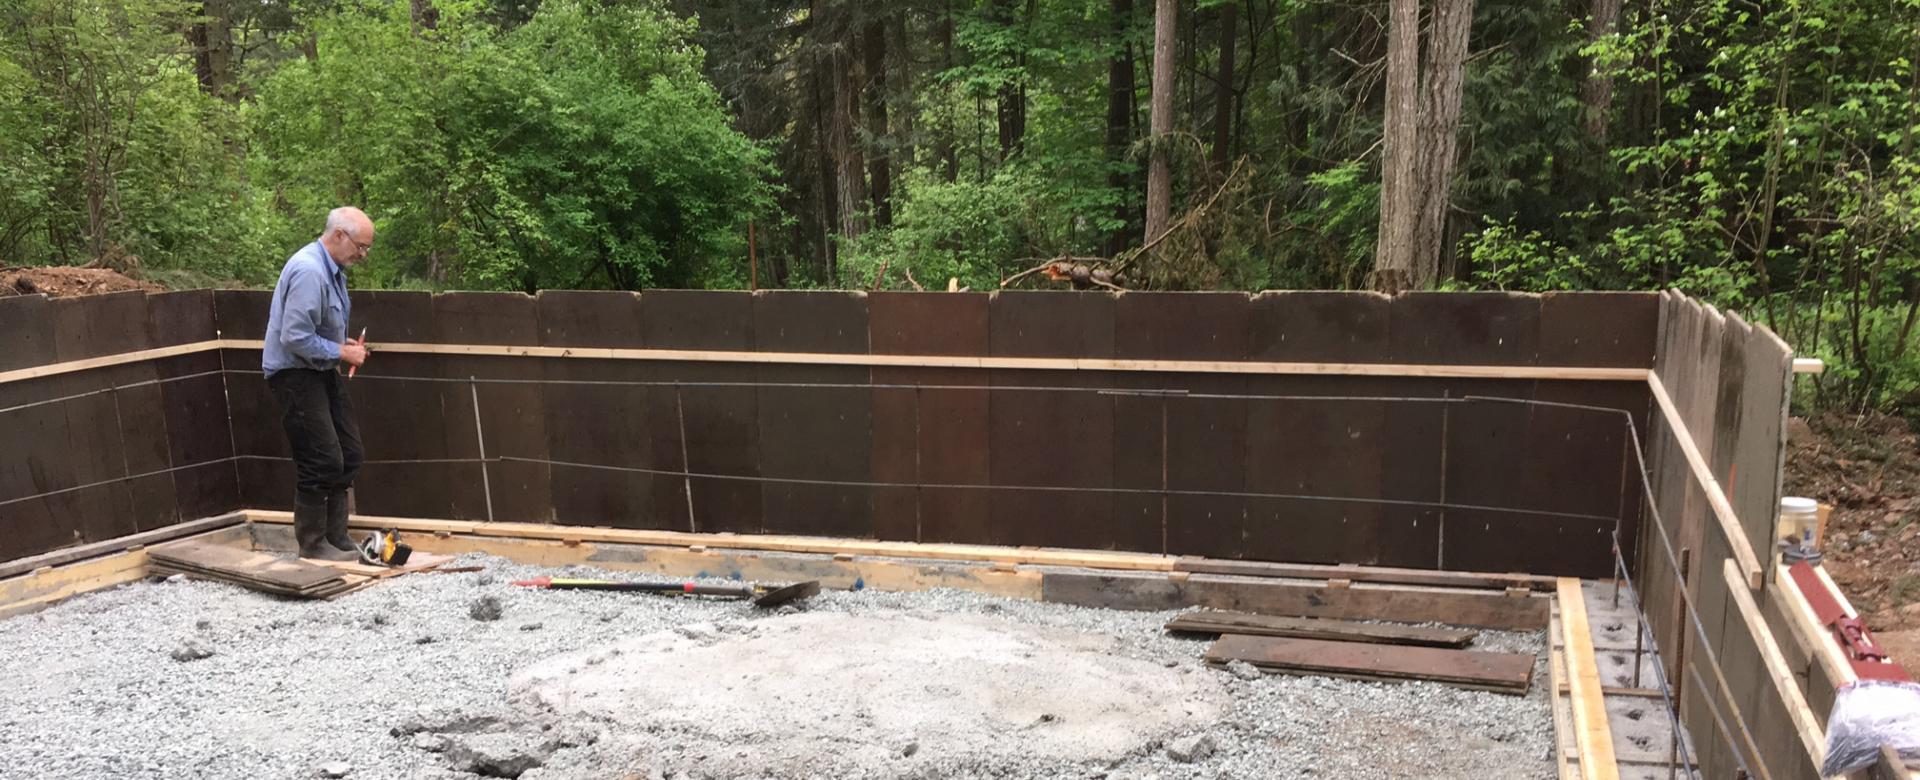 Concrete Form Rentals Victoria BC | Pacific Group Developments